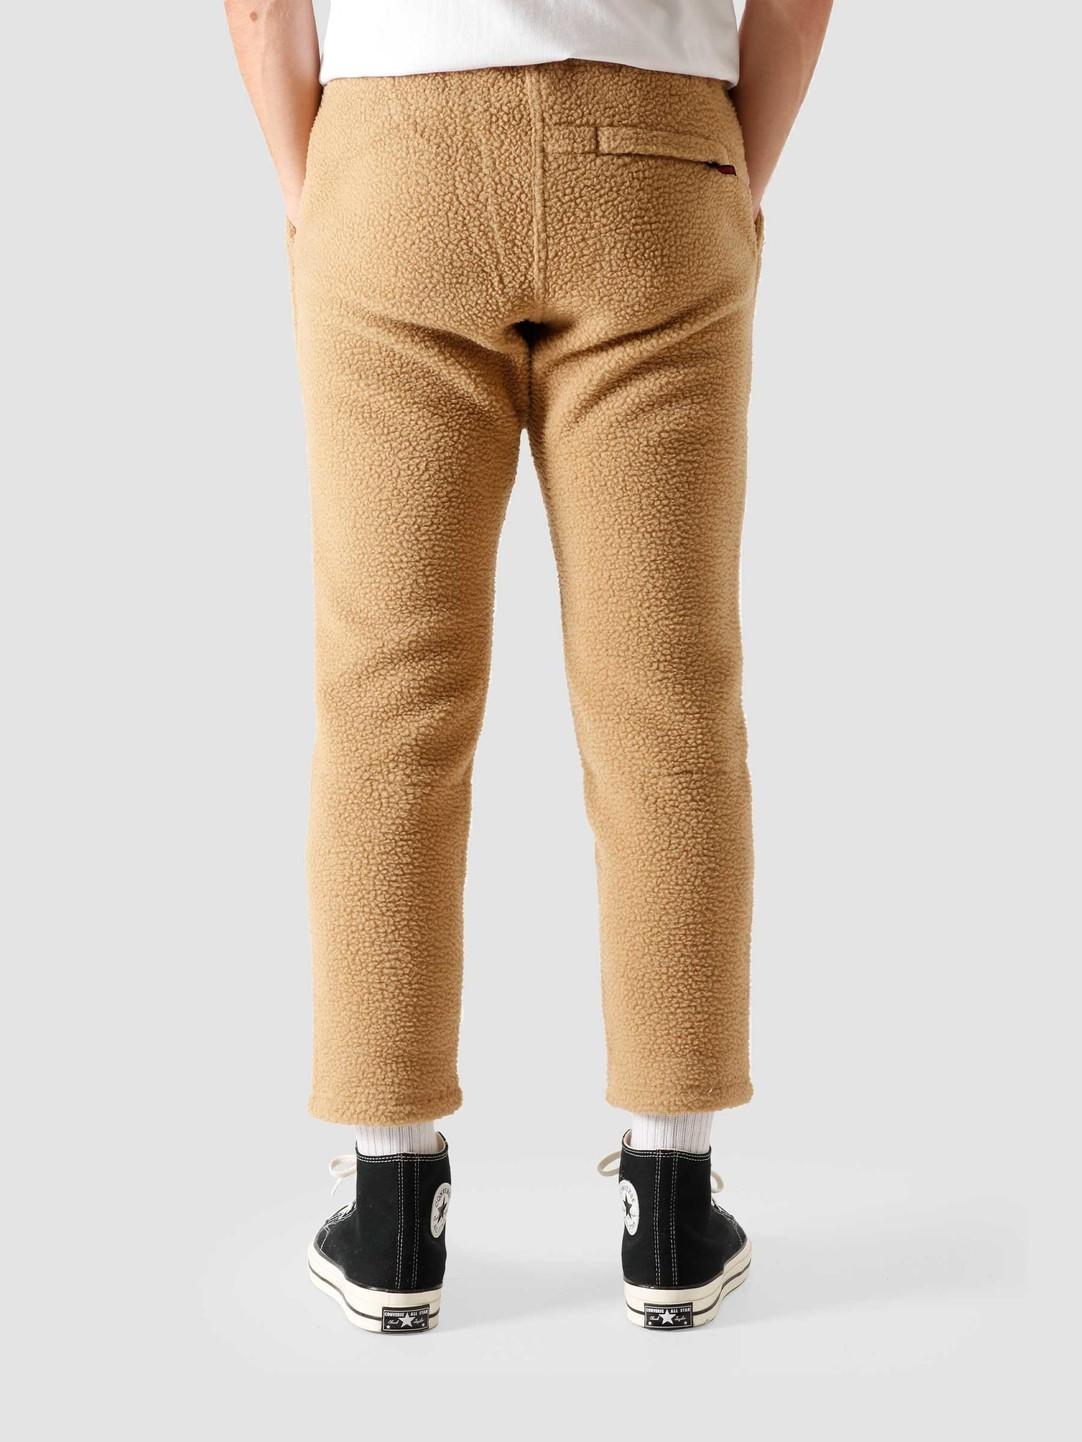 Gramicci Gramicci Boa Fleece Truck Pants Beige GUP-20F041